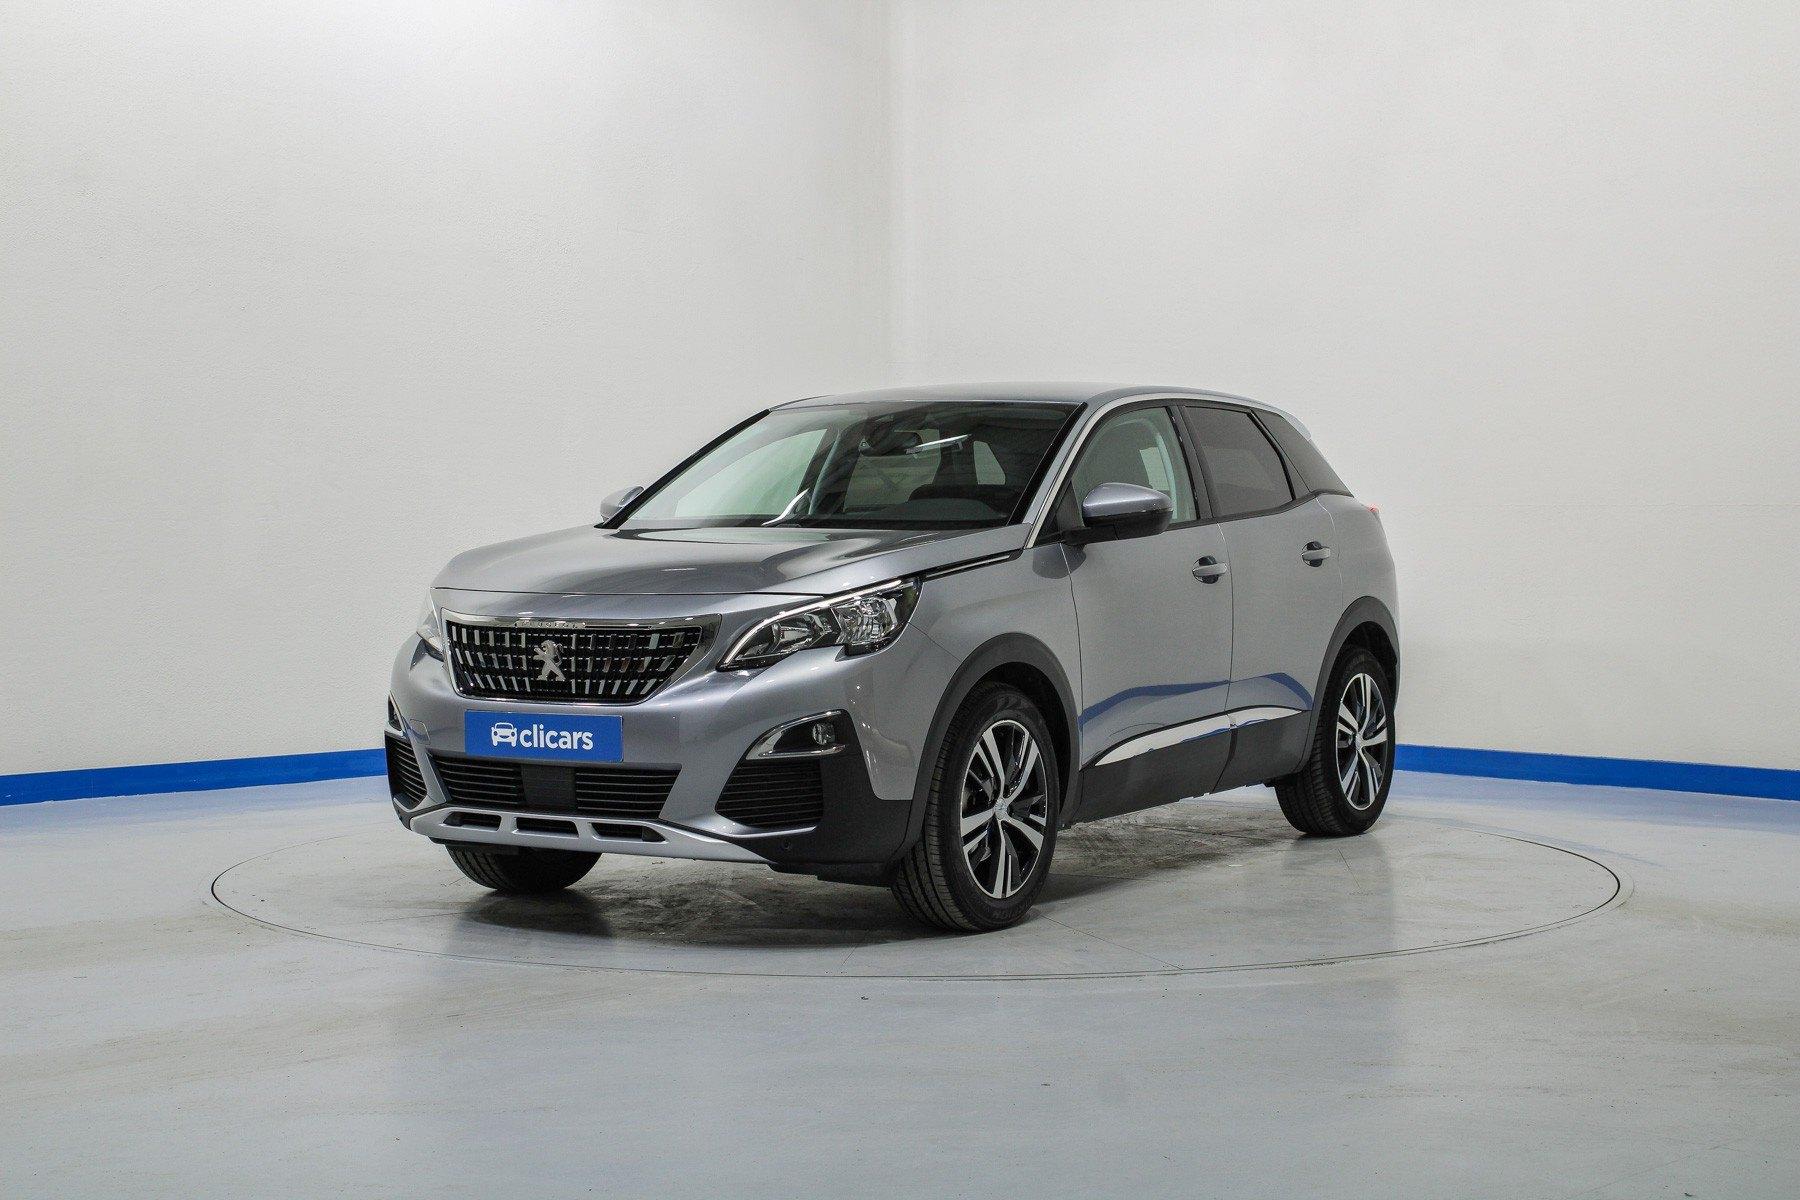 Peugeot 3008 Gasolina 1.2 PURETECH 96KW (130CV) ALLURE S&S 1